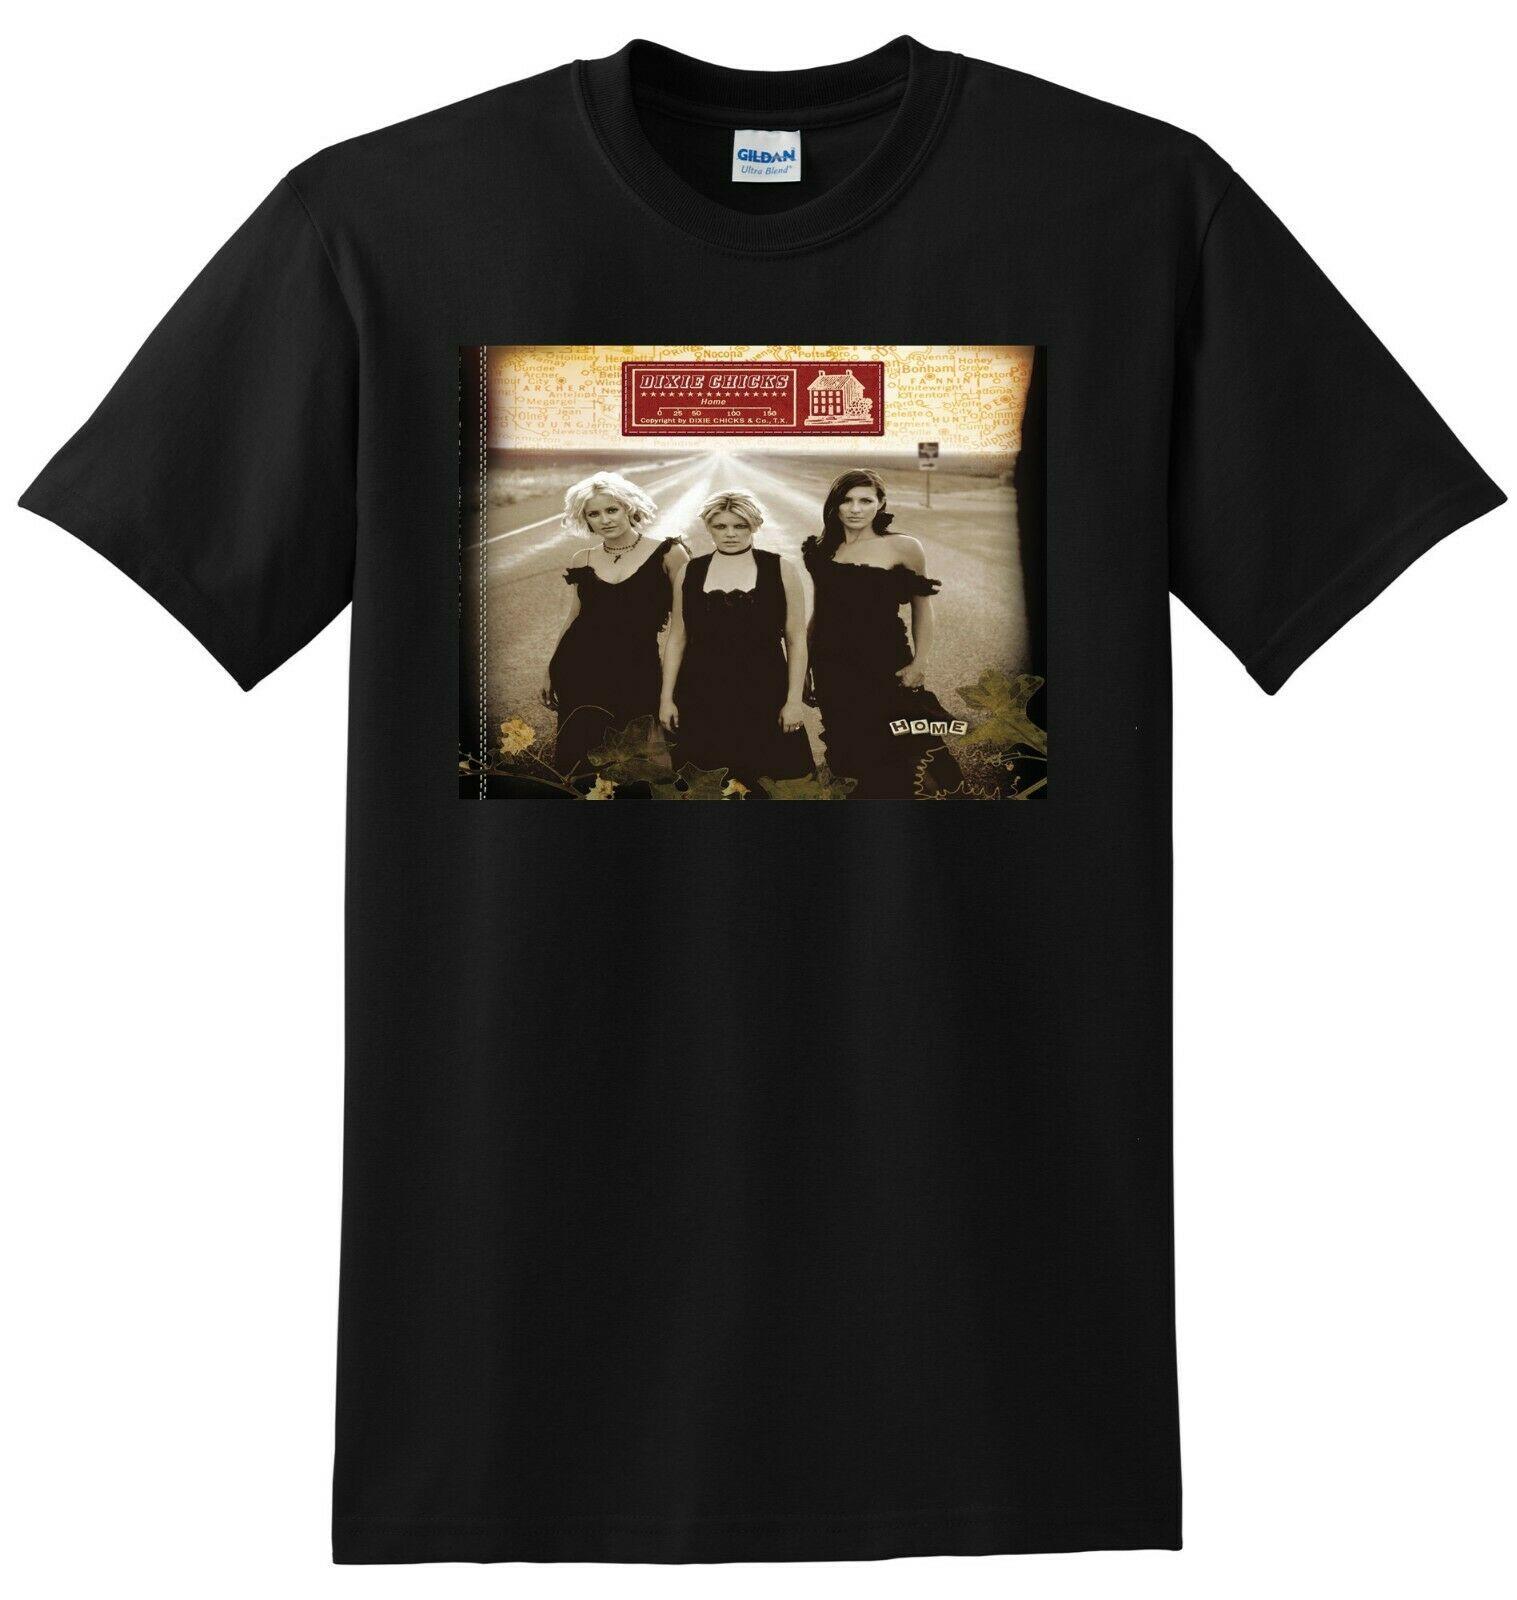 Dixie Chicks T Shirt Home Vinyl Cd Cover Small Medium Large Or Xl